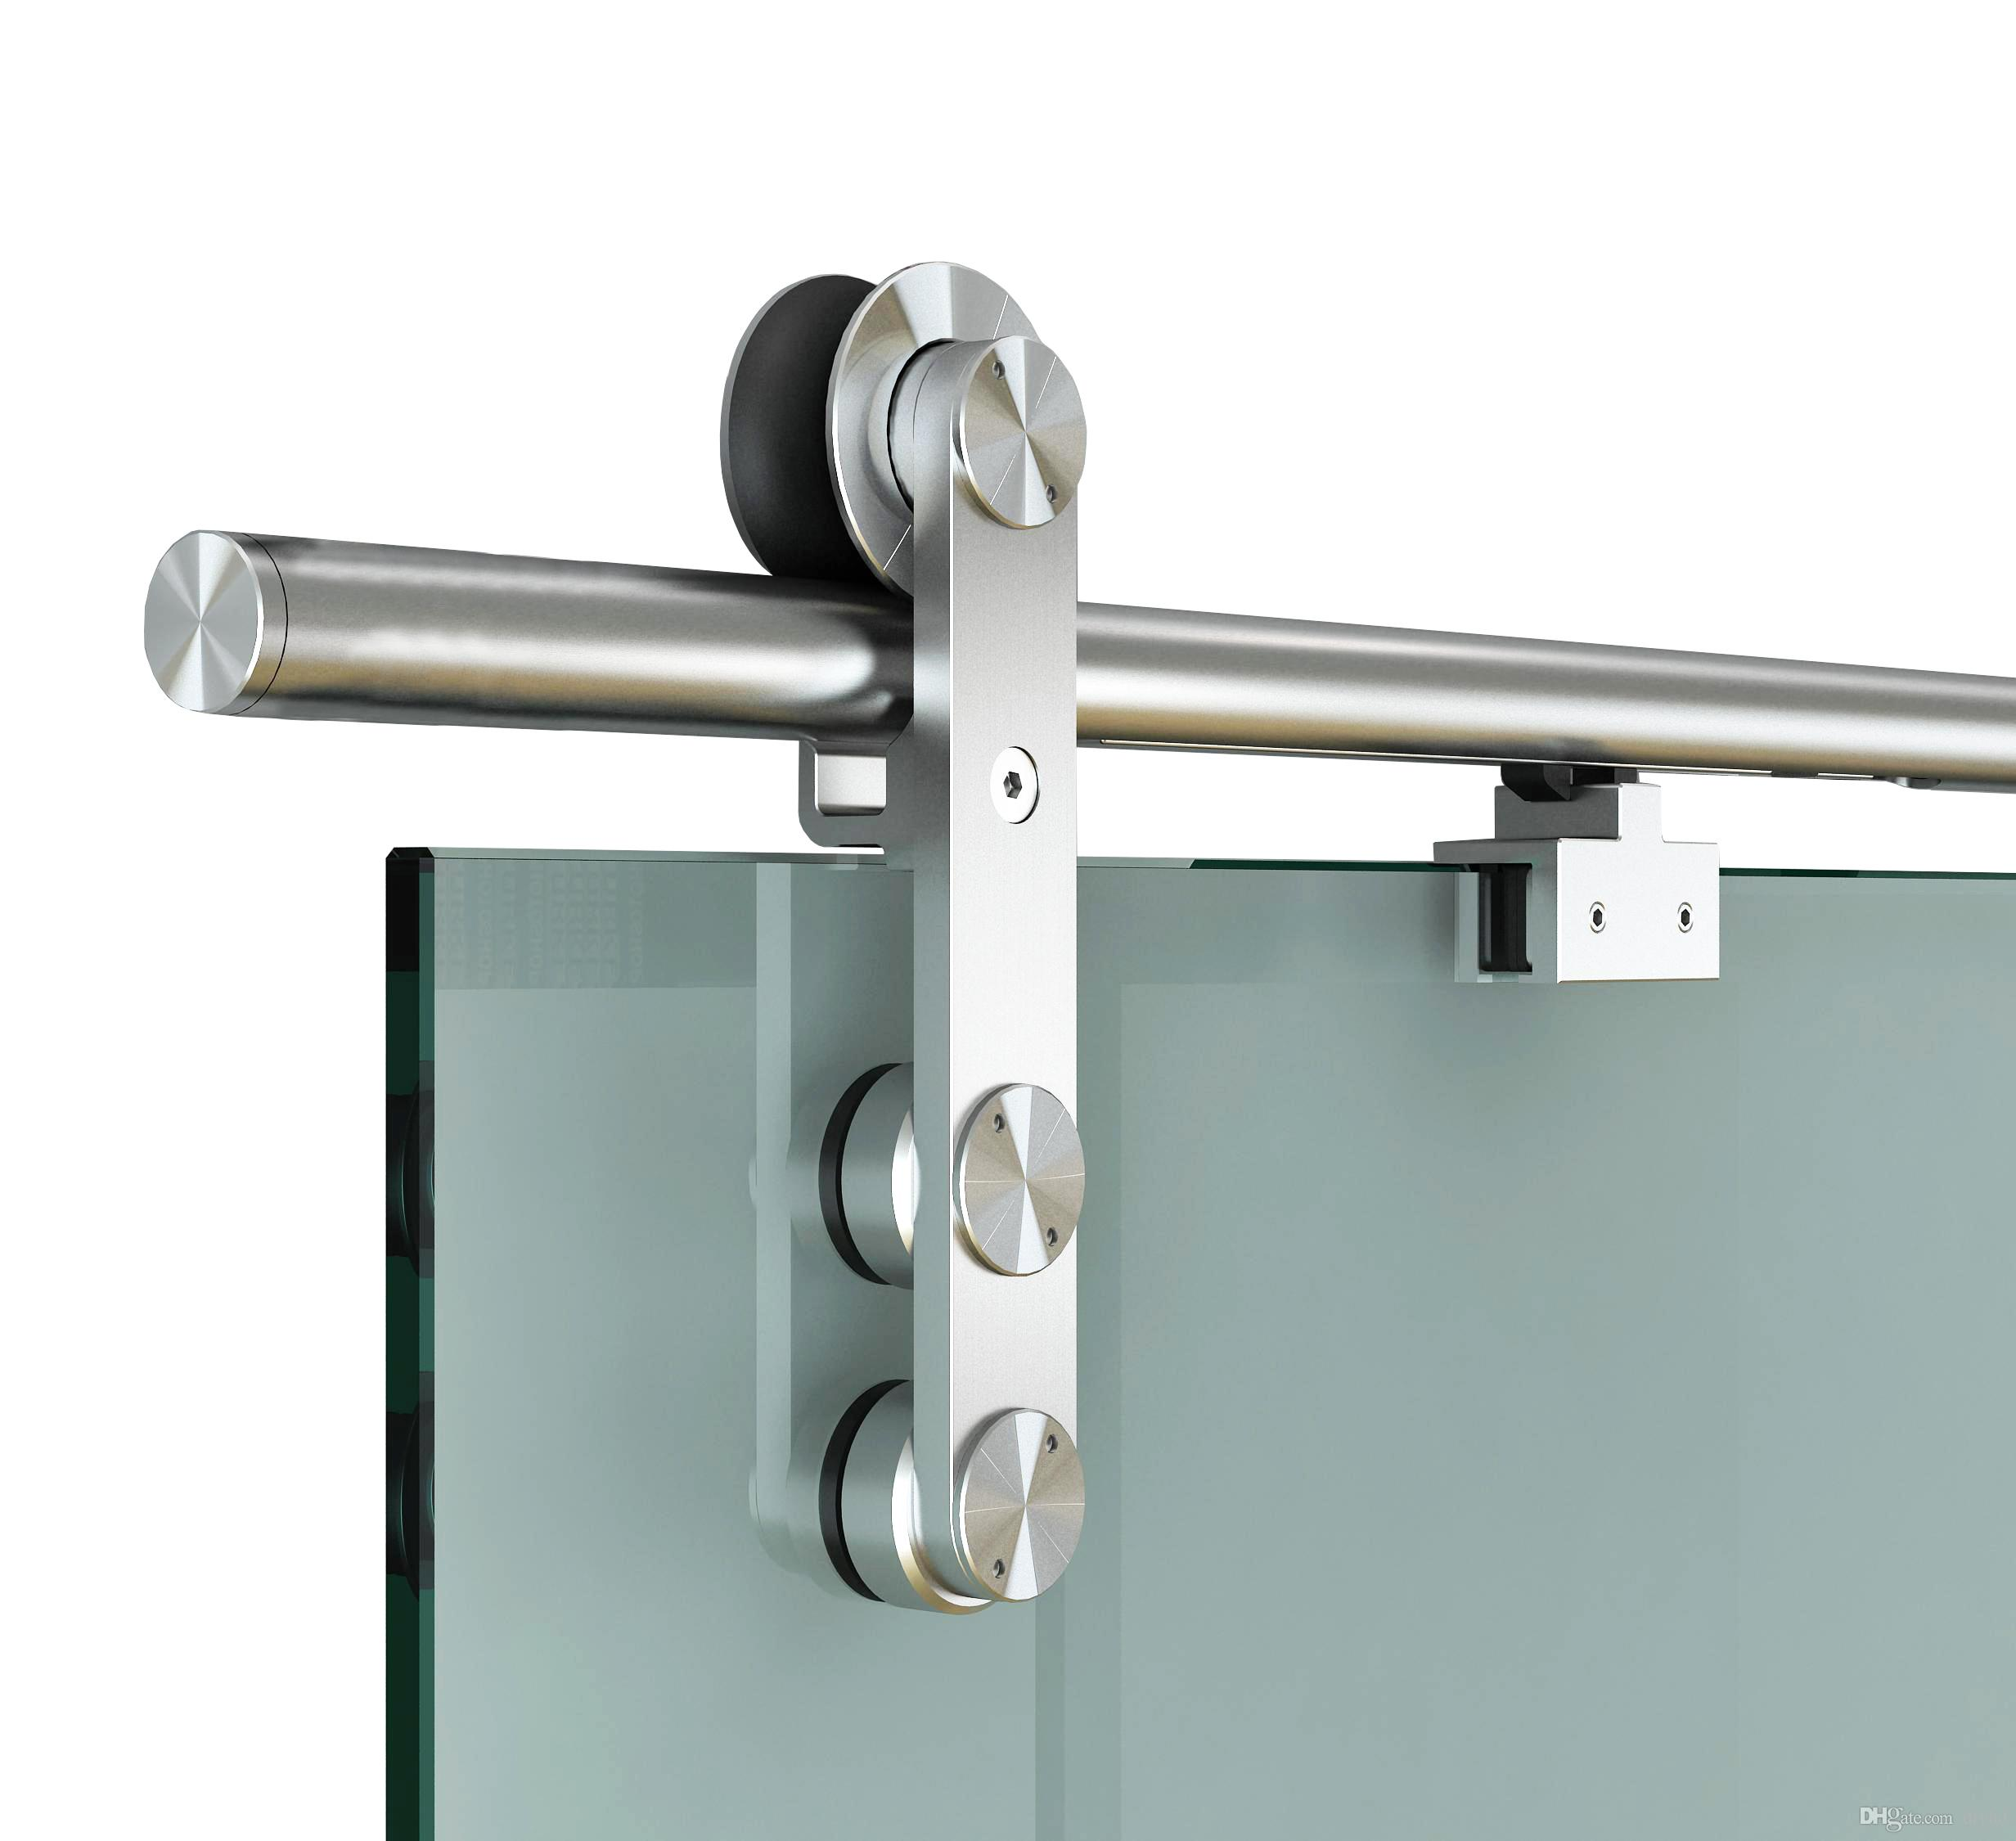 2019 Diyhd 66ft Soft Close Glass Barn Door Hardware Stainless Steel